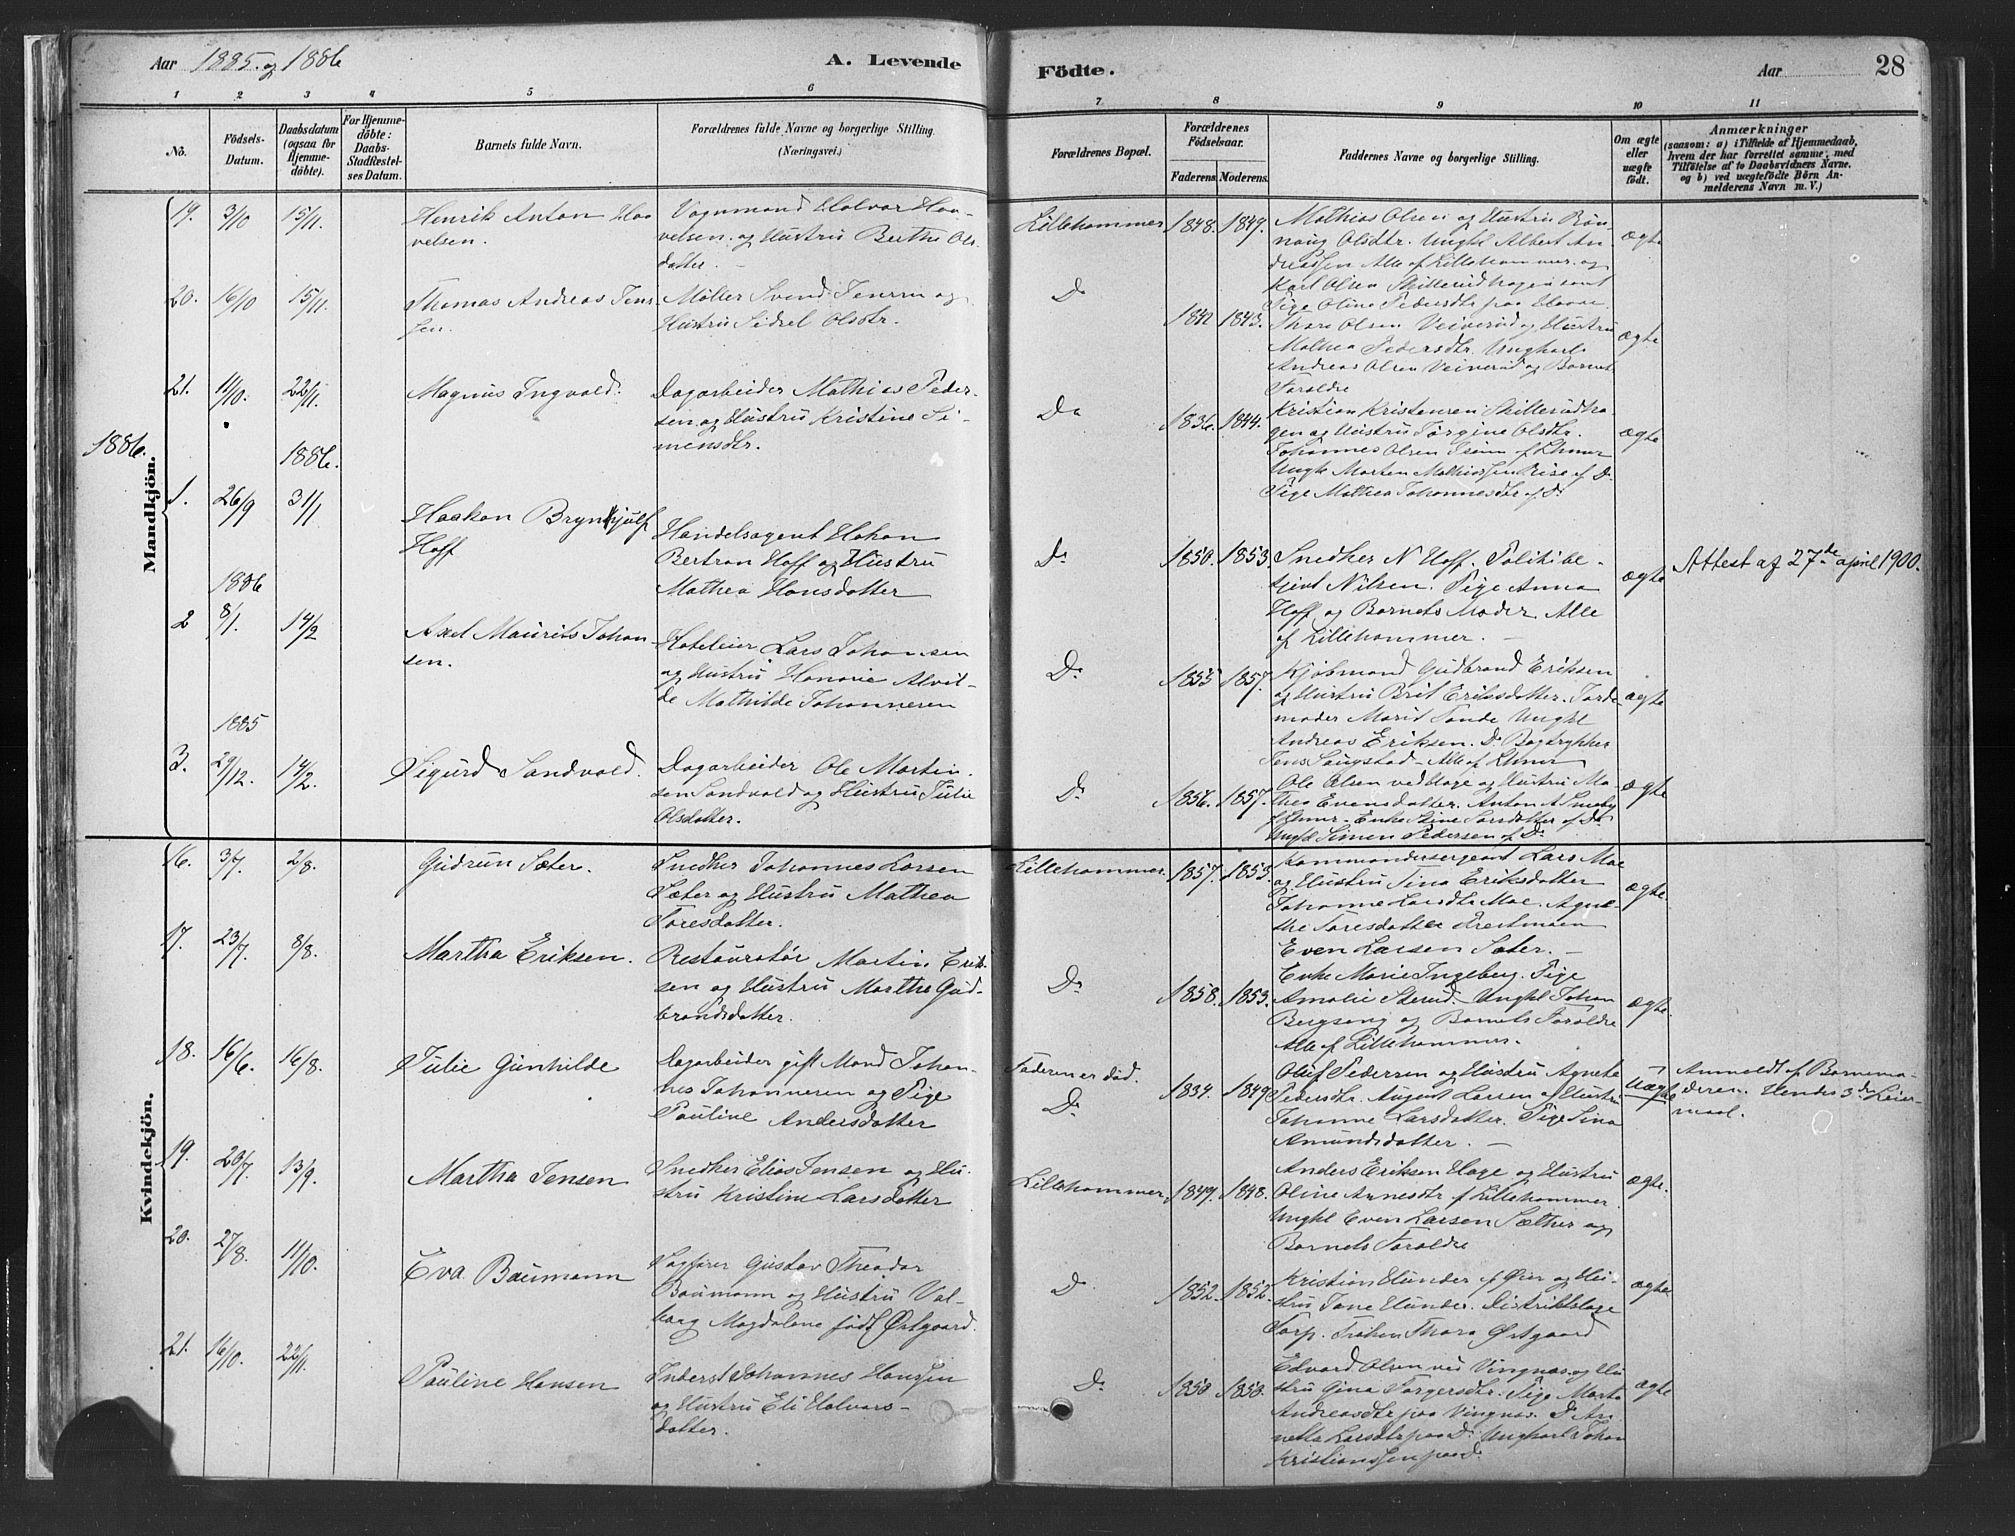 SAH, Fåberg prestekontor, H/Ha/Haa/L0010: Parish register (official) no. 10, 1879-1900, p. 28